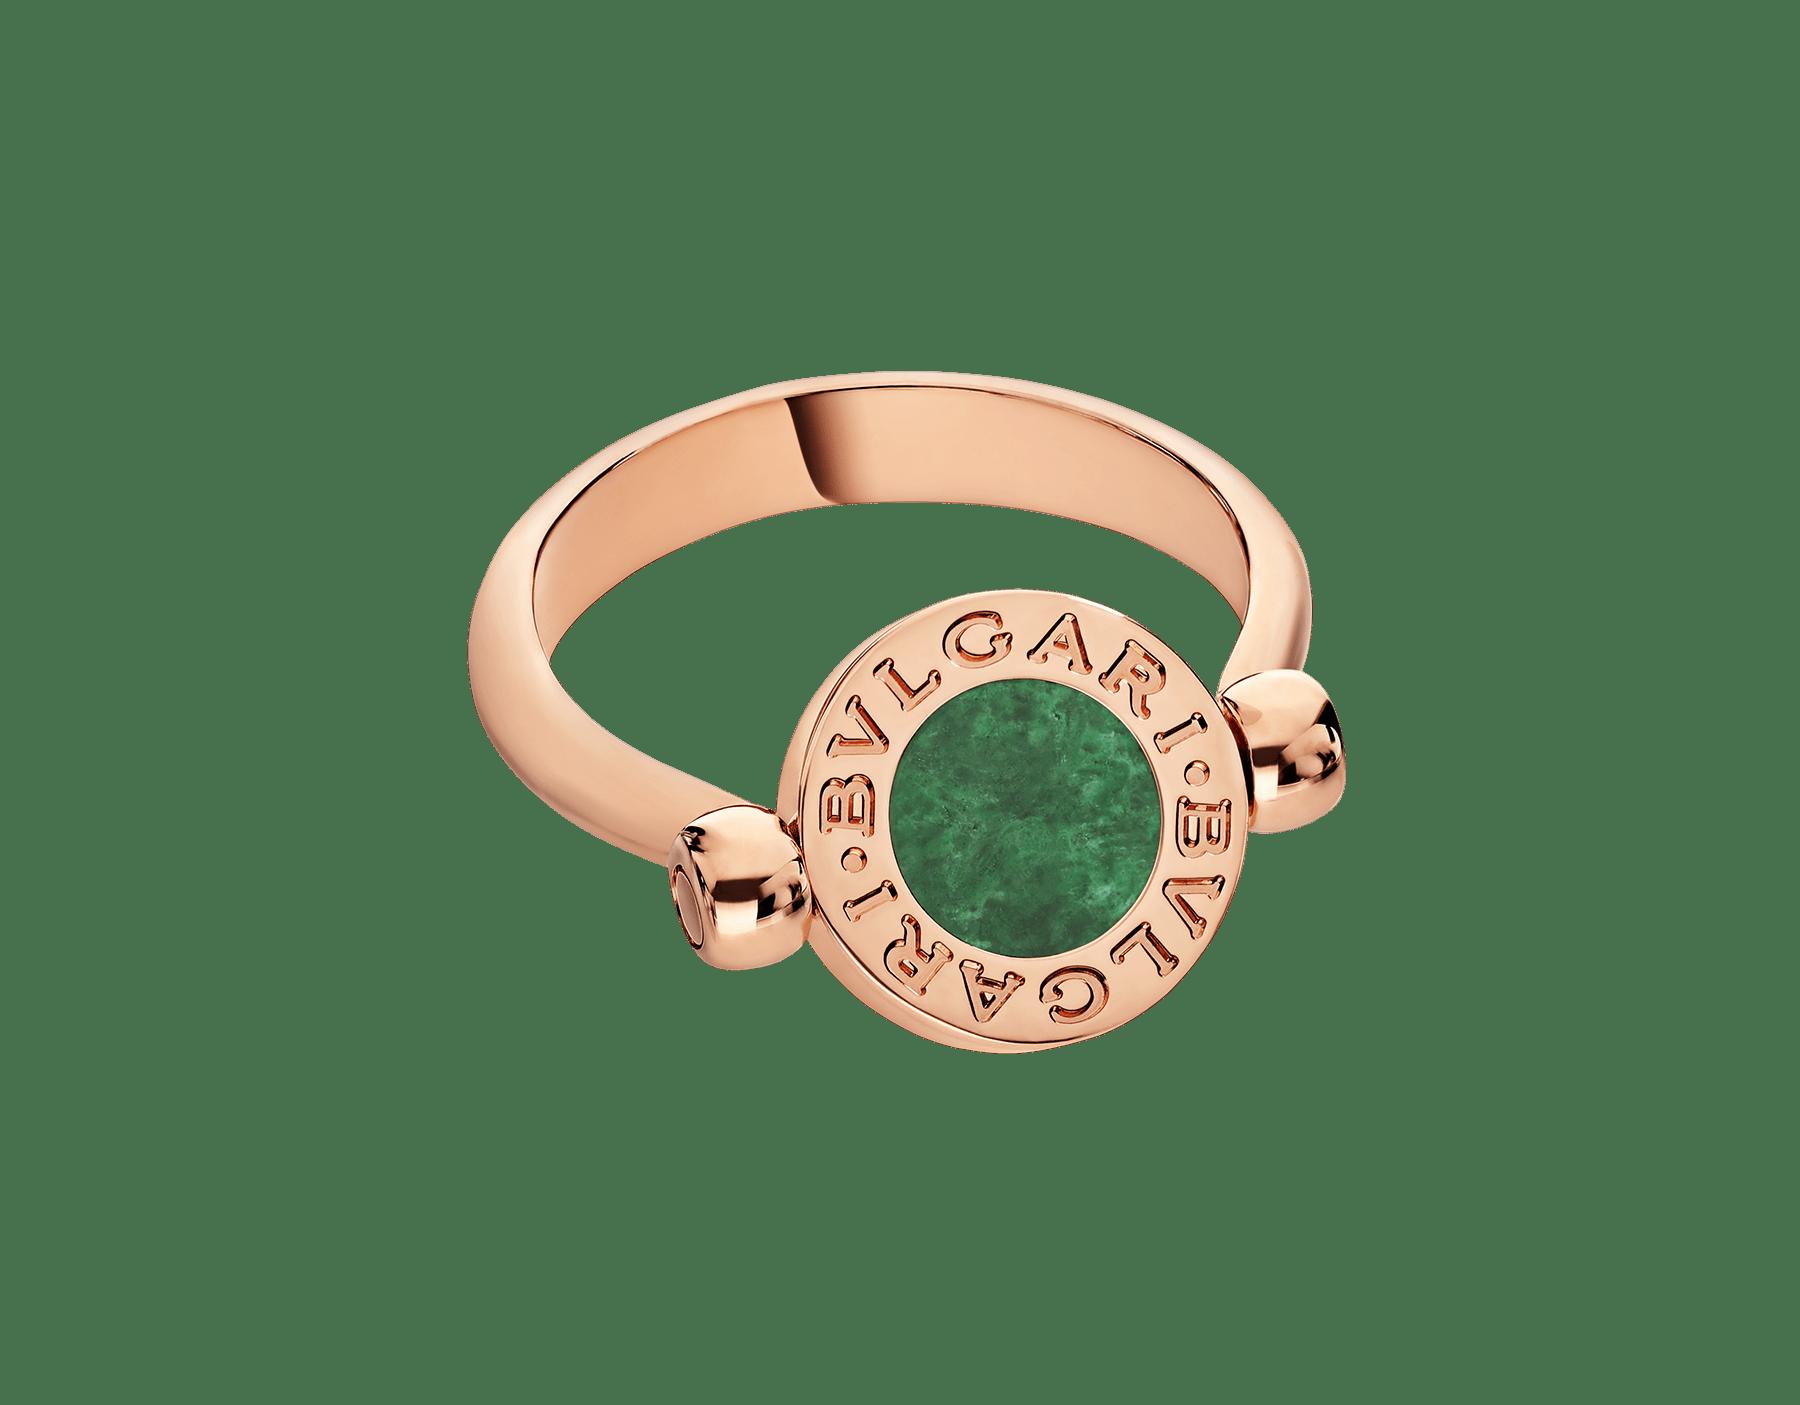 BVLGARI BVLGARI 18 kt rose gold flip ring set with green jade and pavé diamonds AN857356 image 2